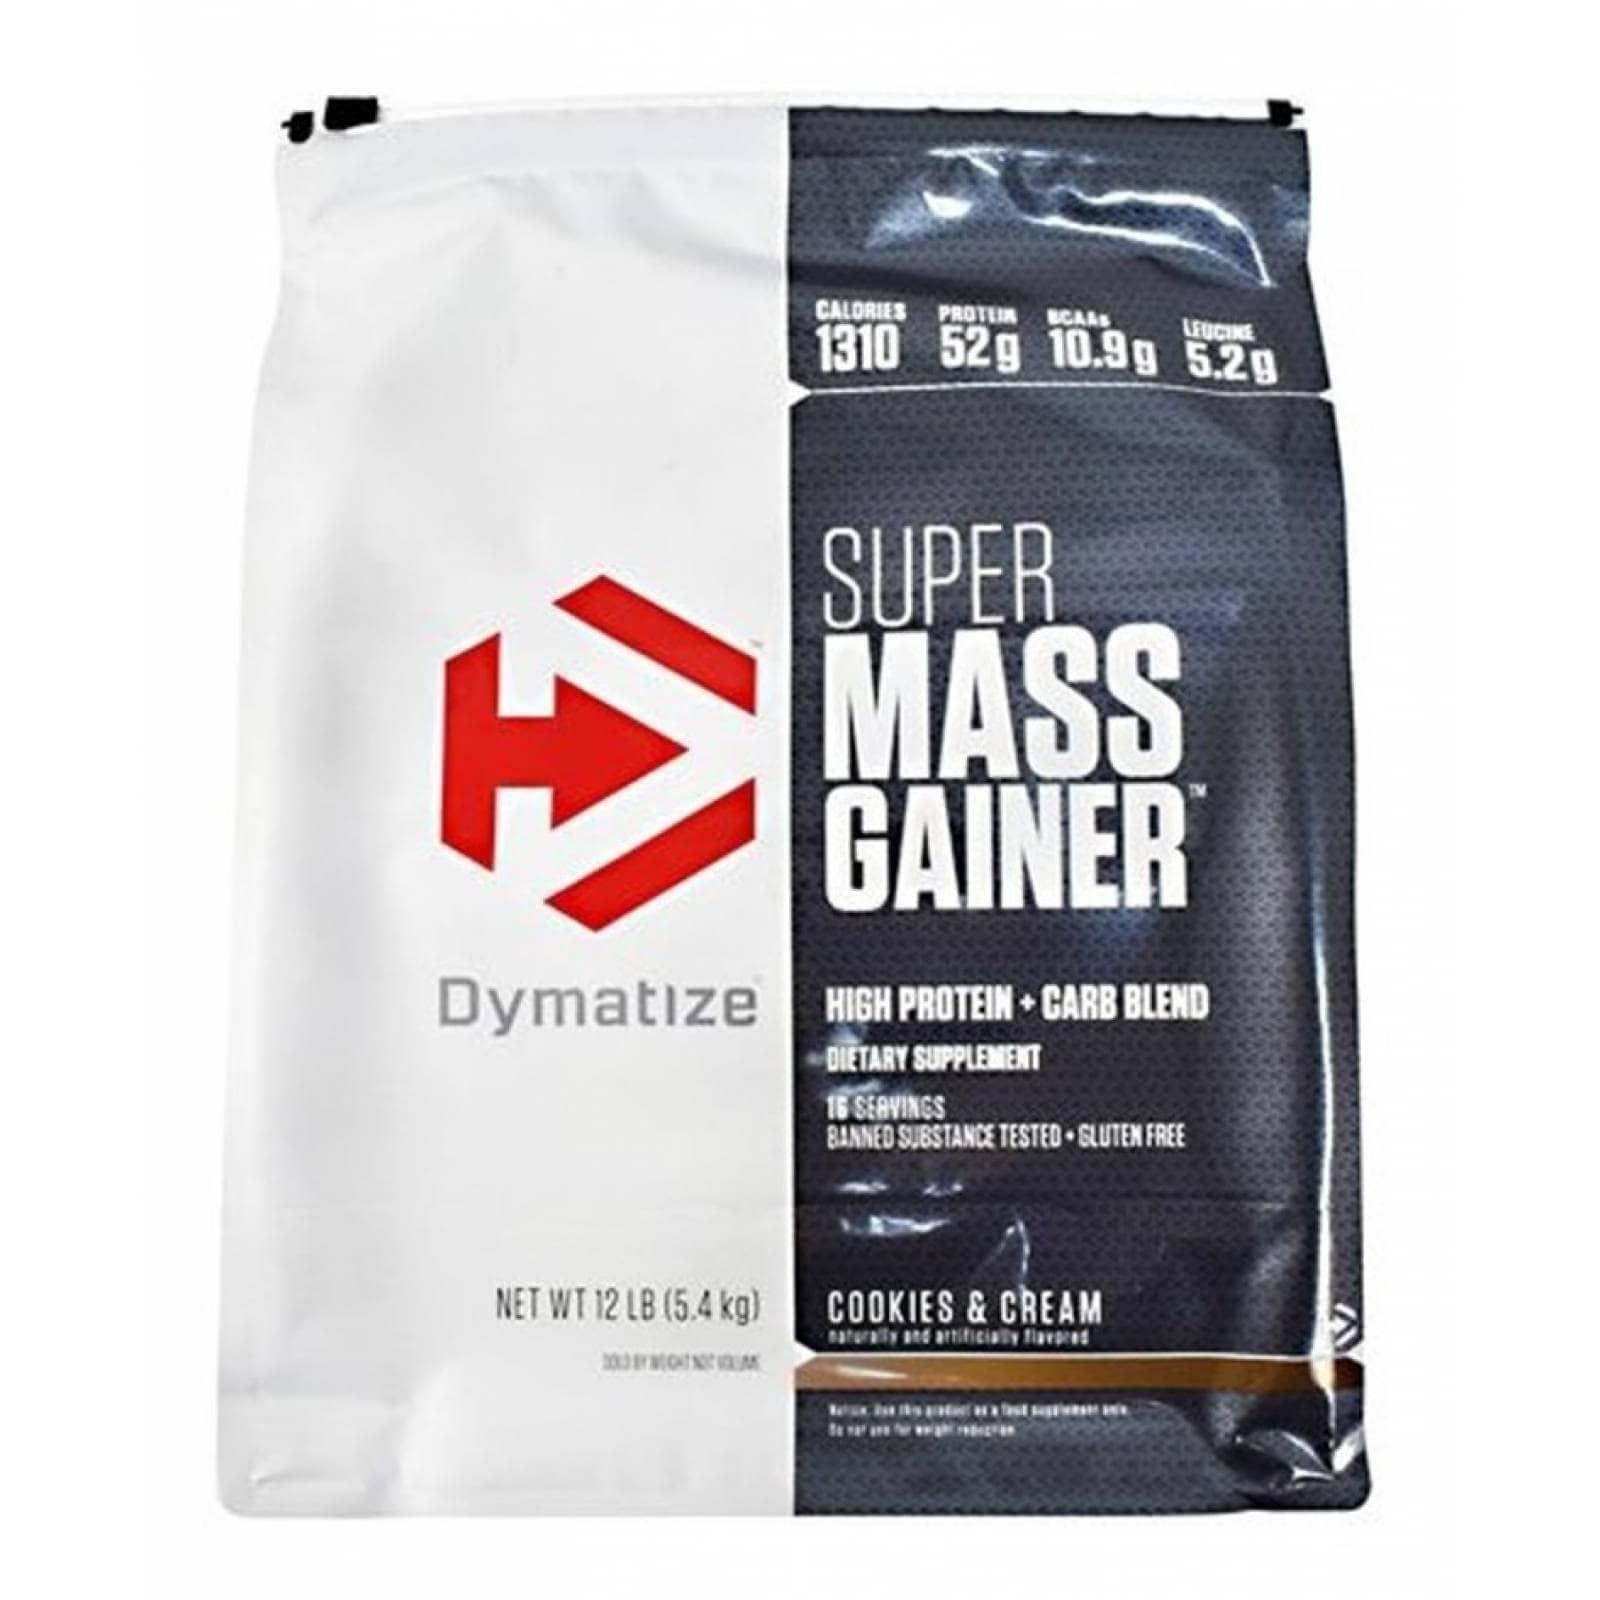 DYM SUPER MASS GAINER 12 LBS COOKIES & CREAM